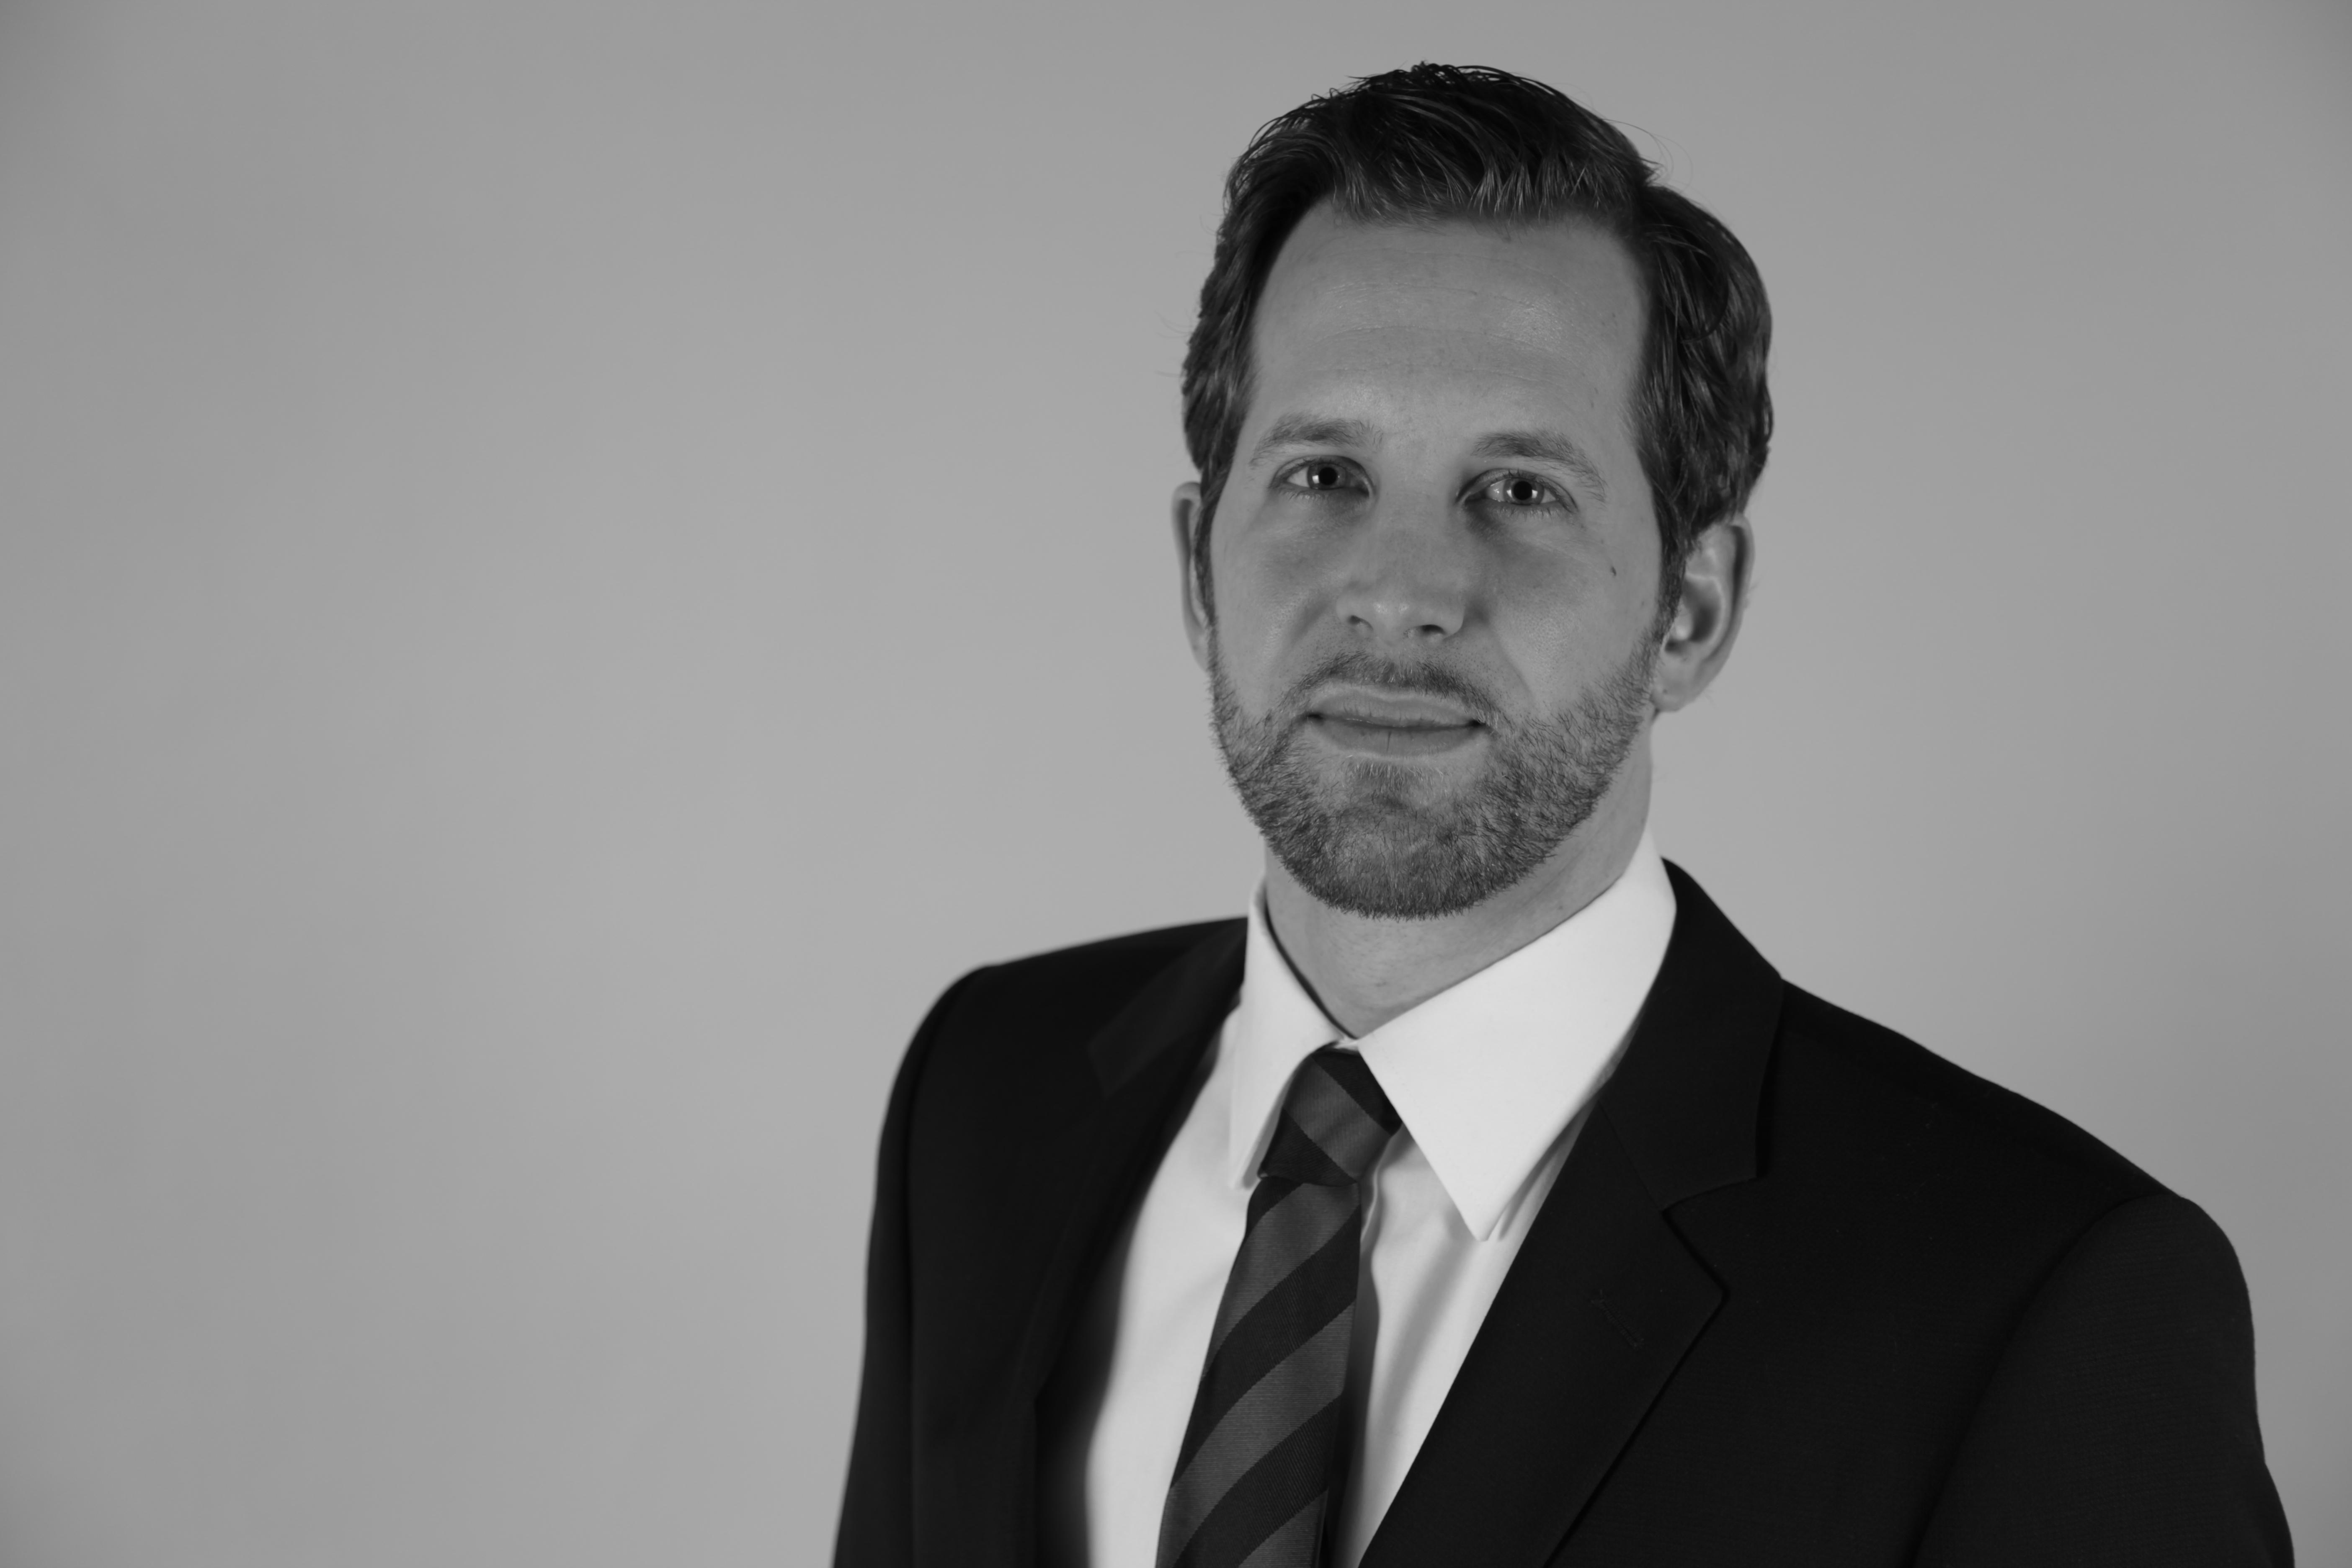 Marcel-Dahlke-Rechtsanwalt-Wuppertal